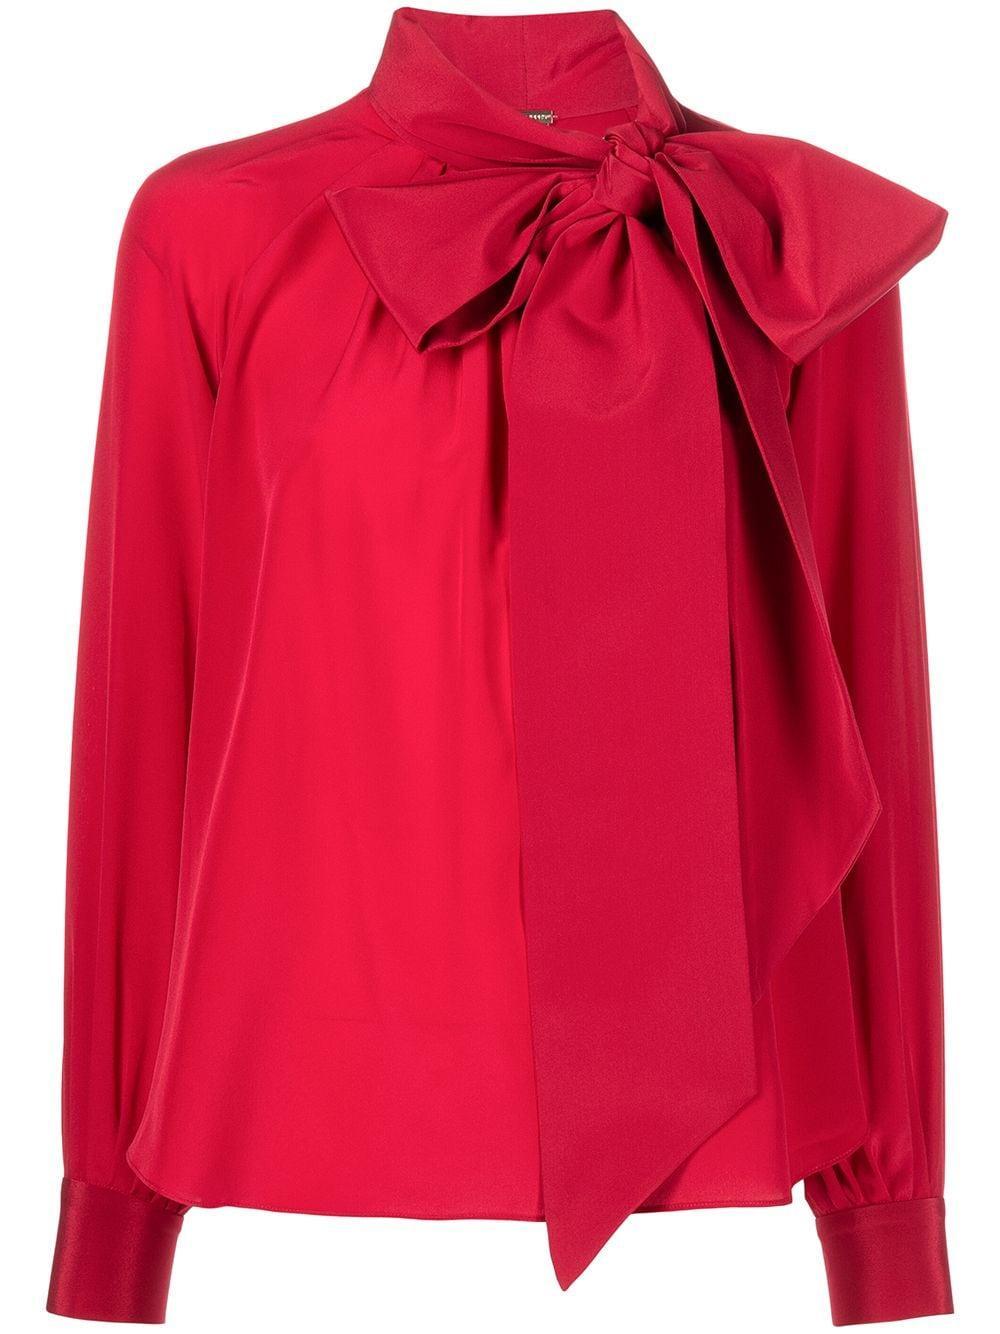 Silk Bow Neck Blouse Item # F21124CR